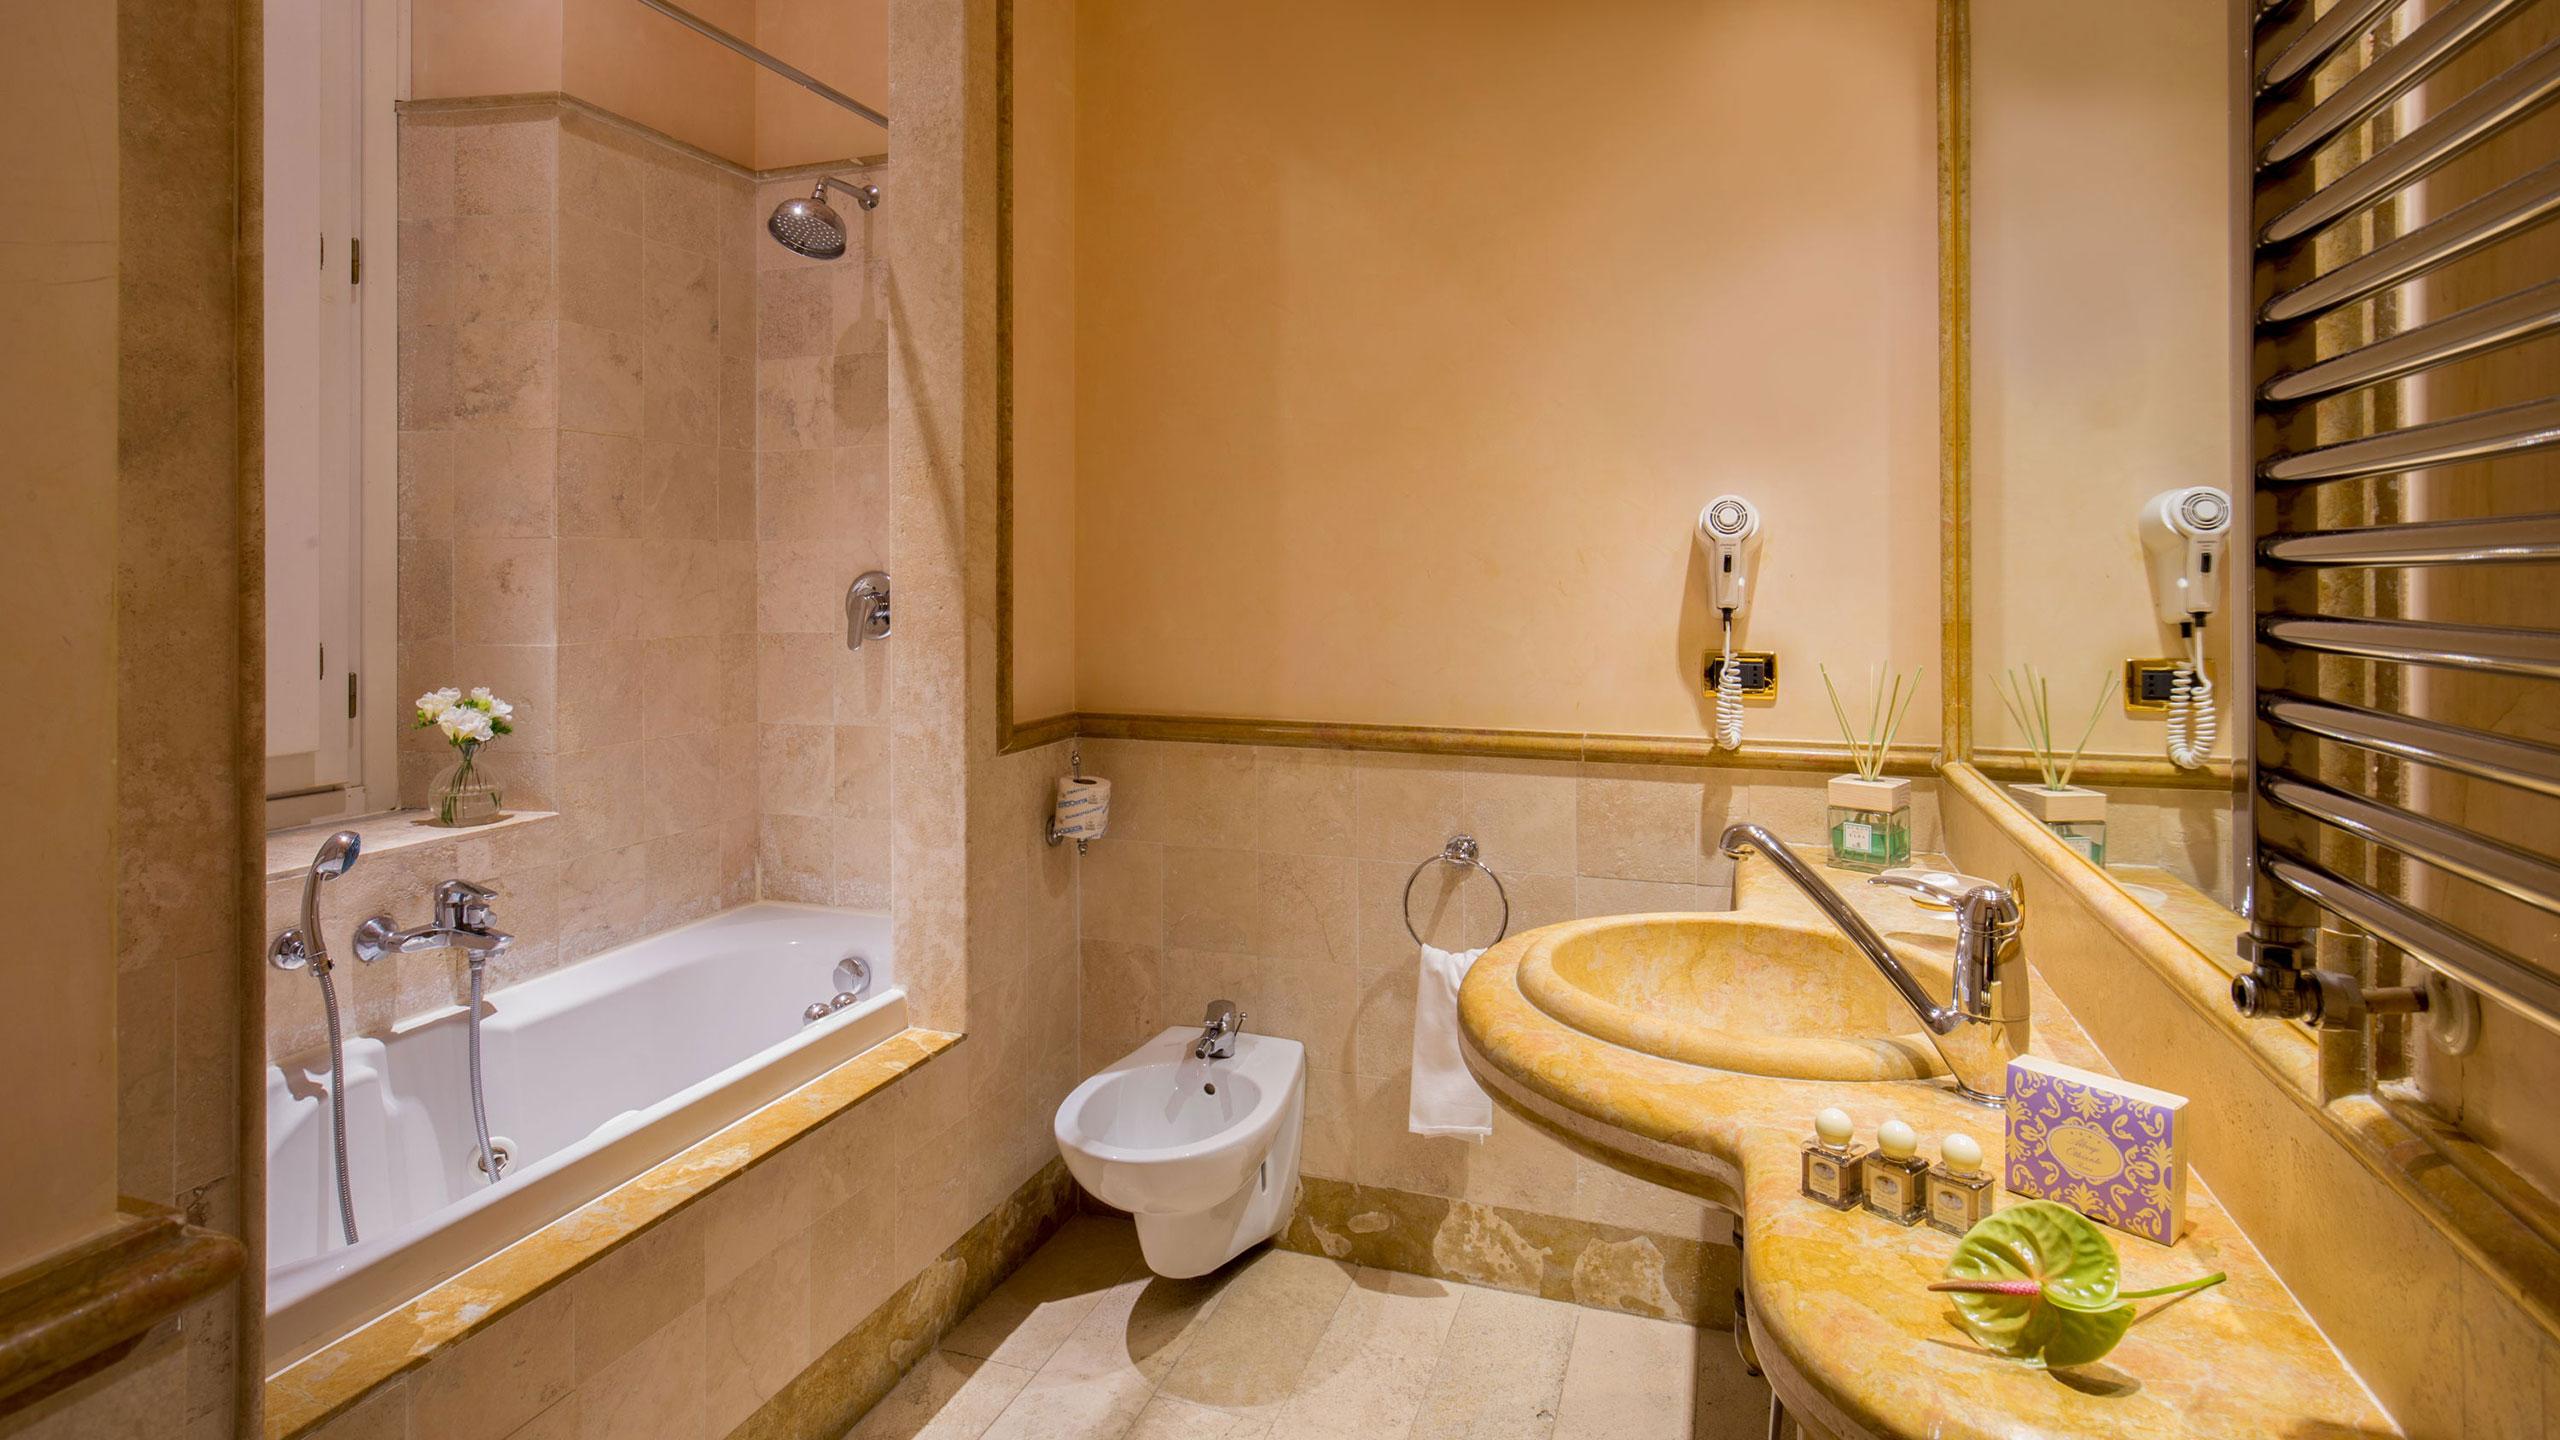 albergo-ottocento-rome-bathroom-15